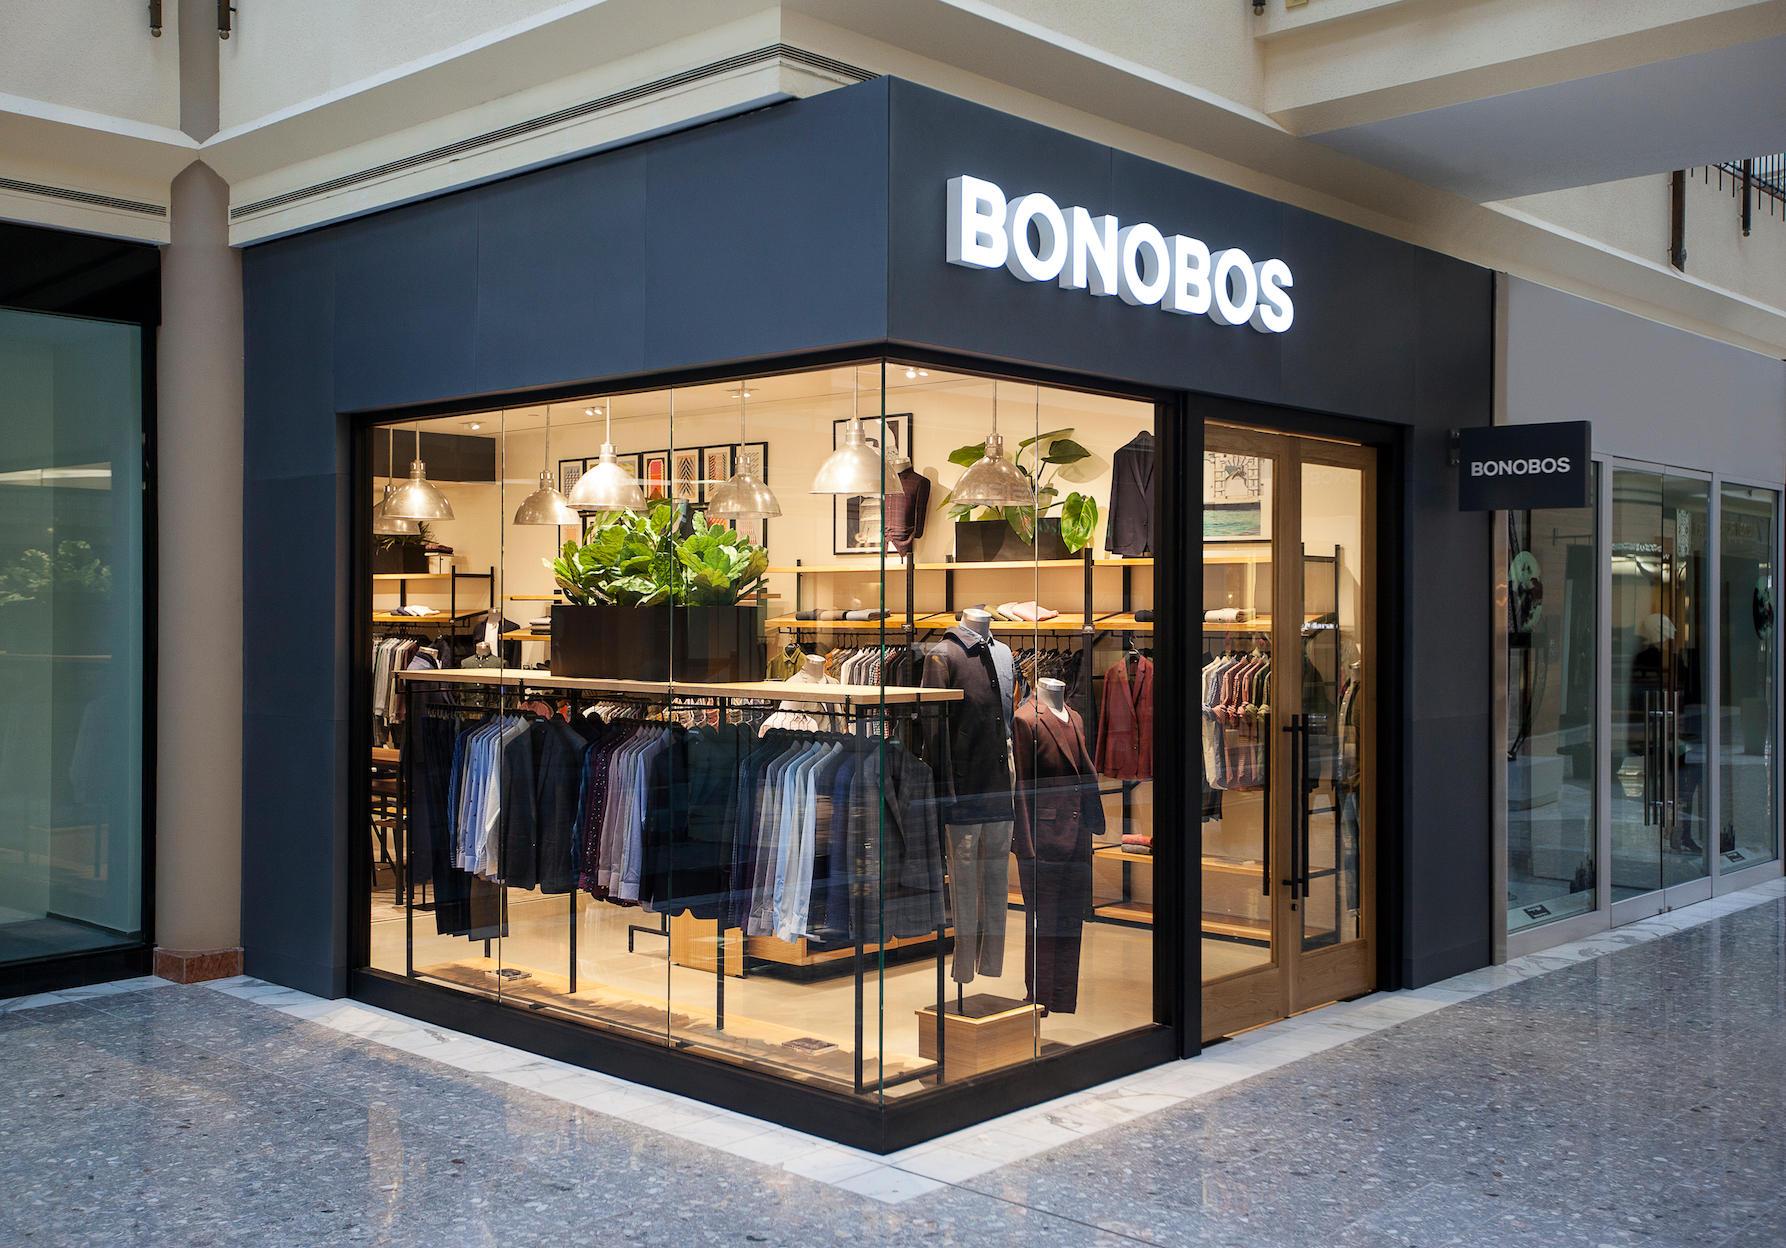 Bonobos image 1